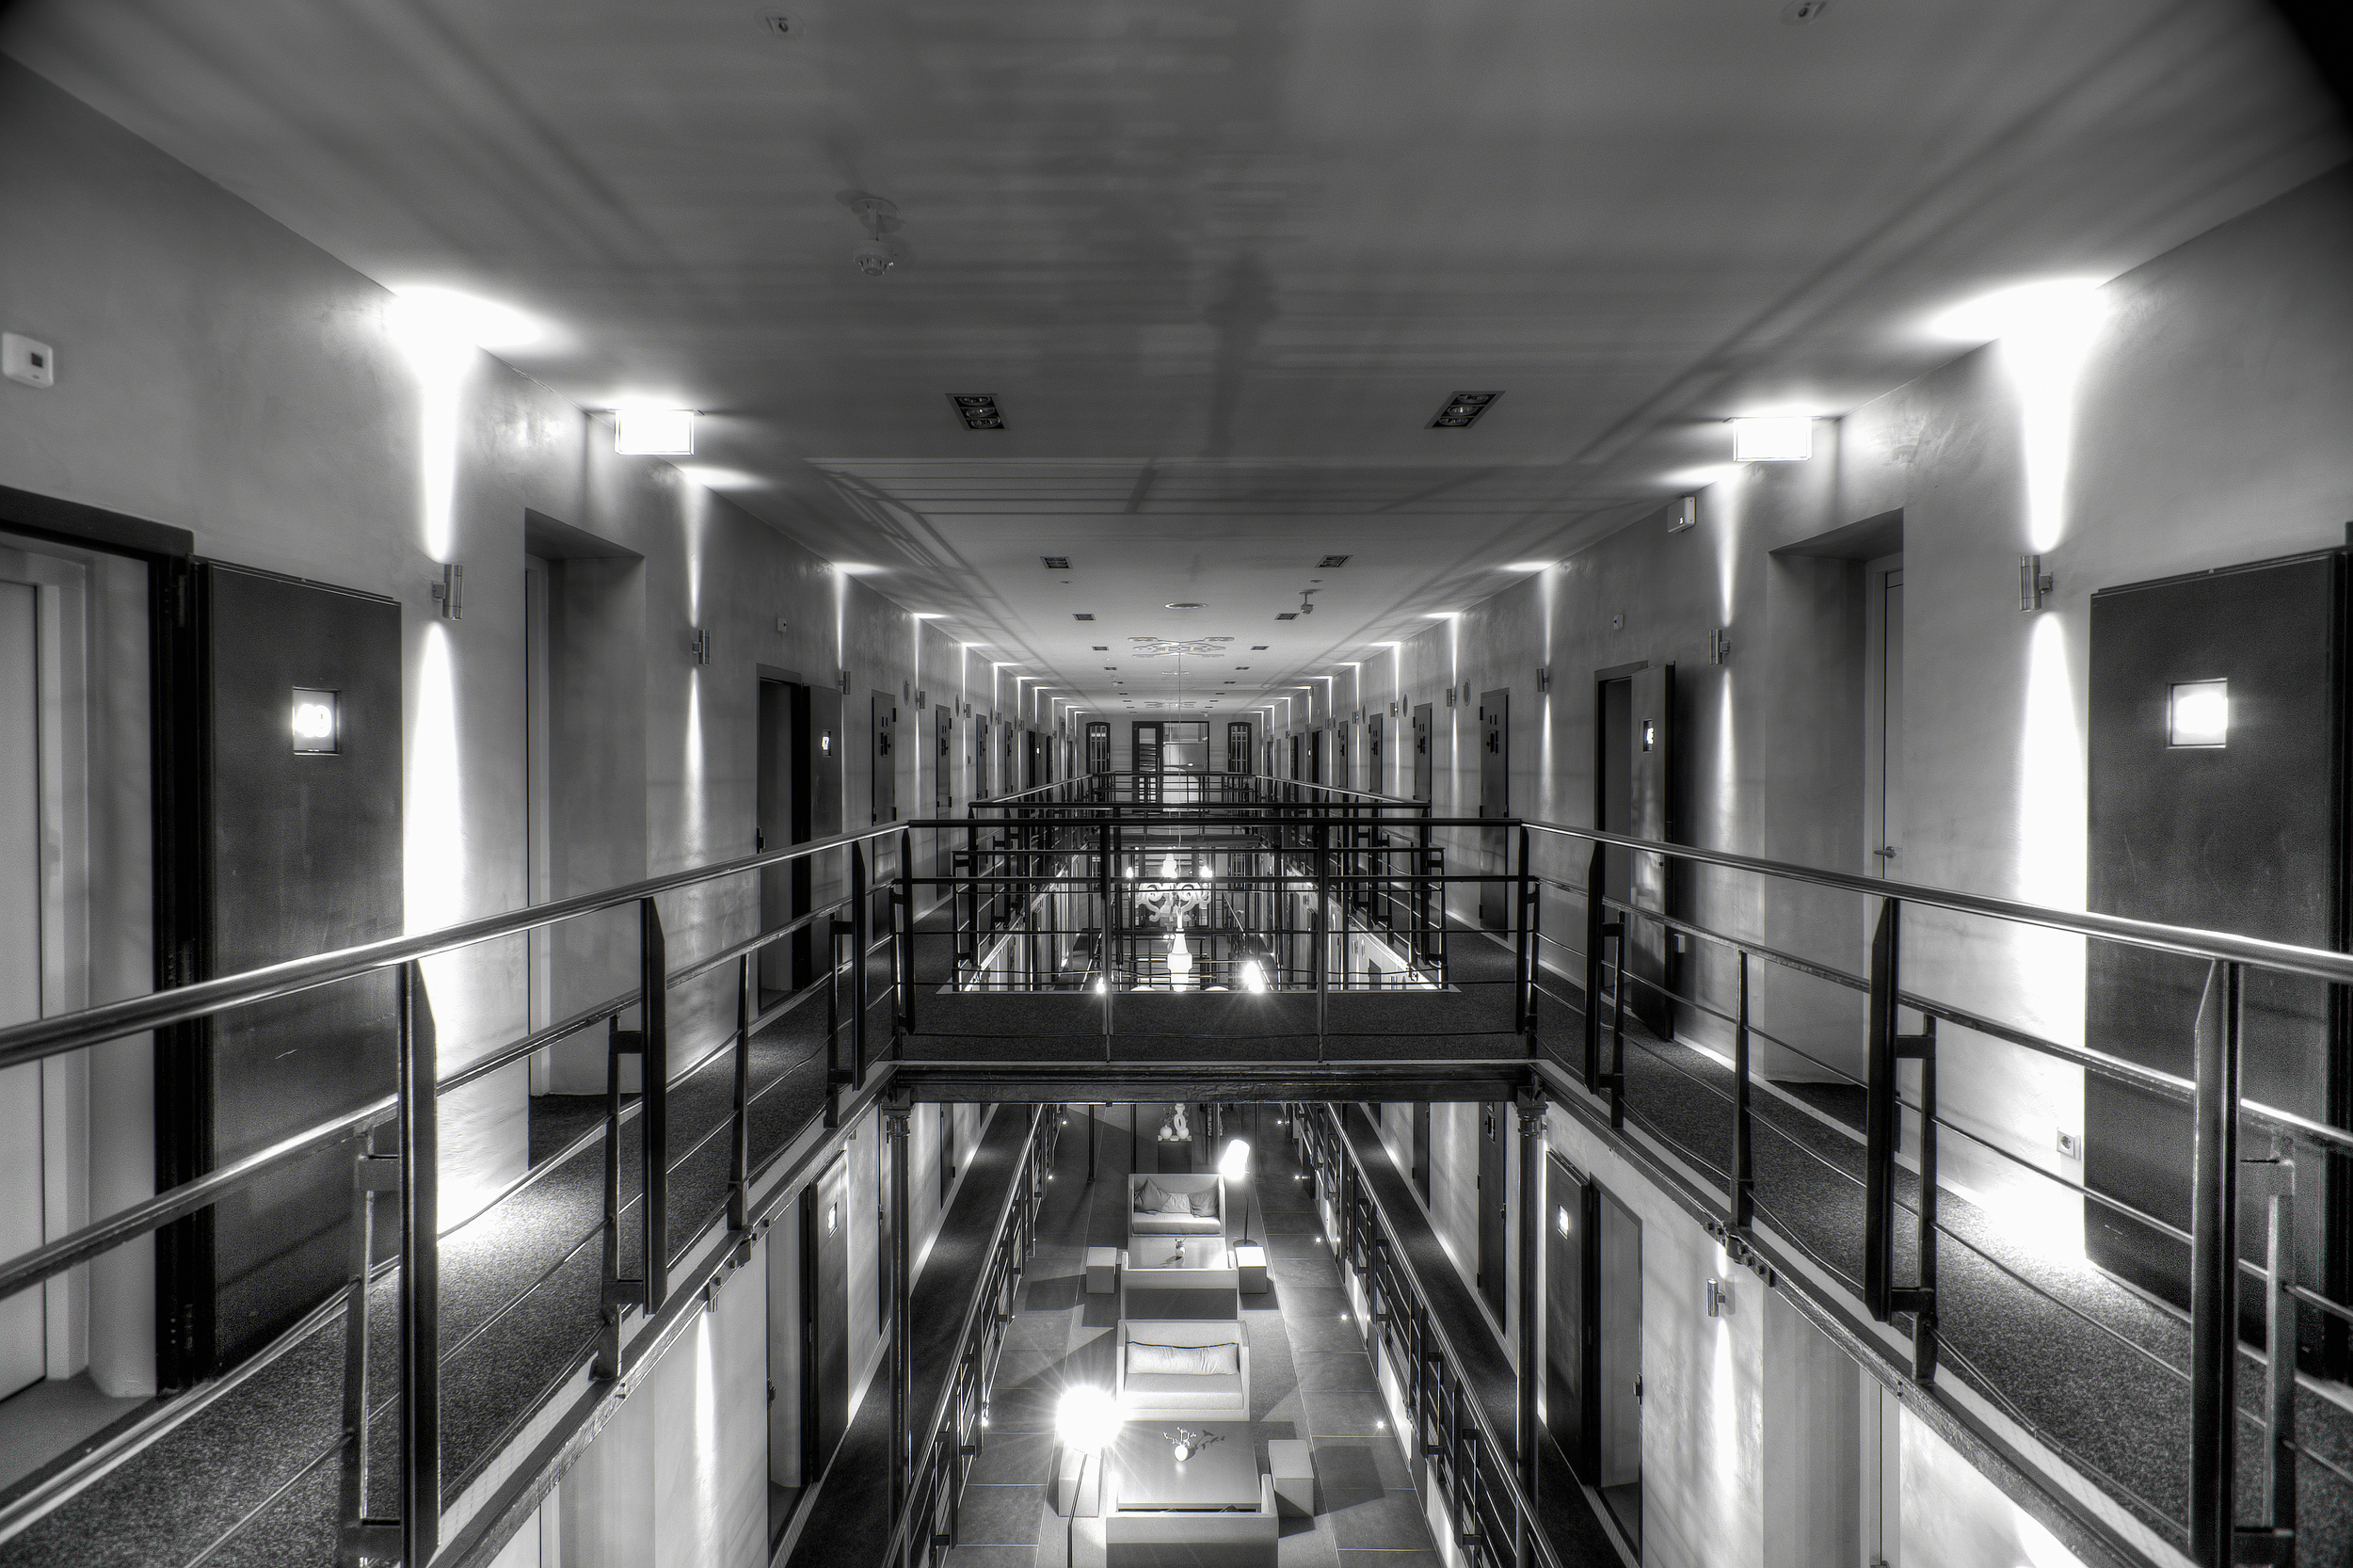 Archi.int_Het_Arresthuis_20110509_HDR03.jpg